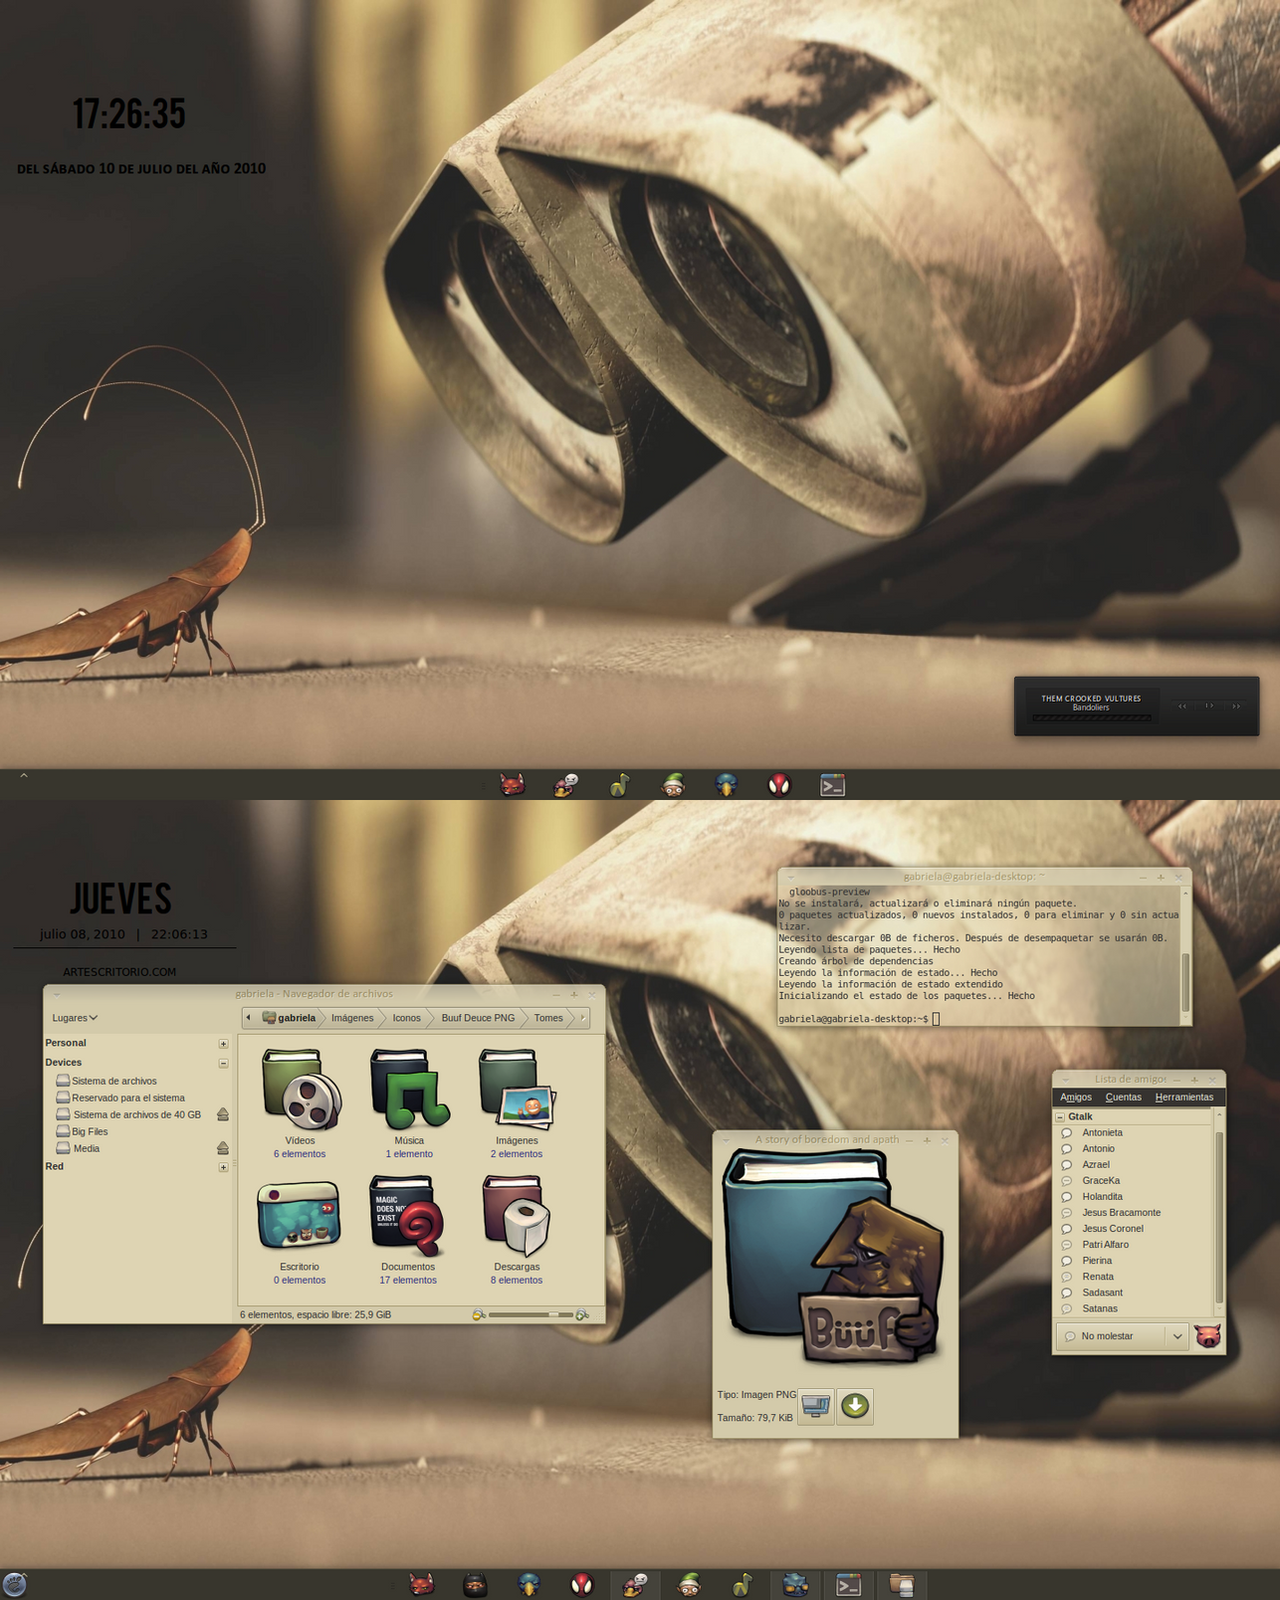 Wall-e and Buuf at Ubuntu by gabriela2400